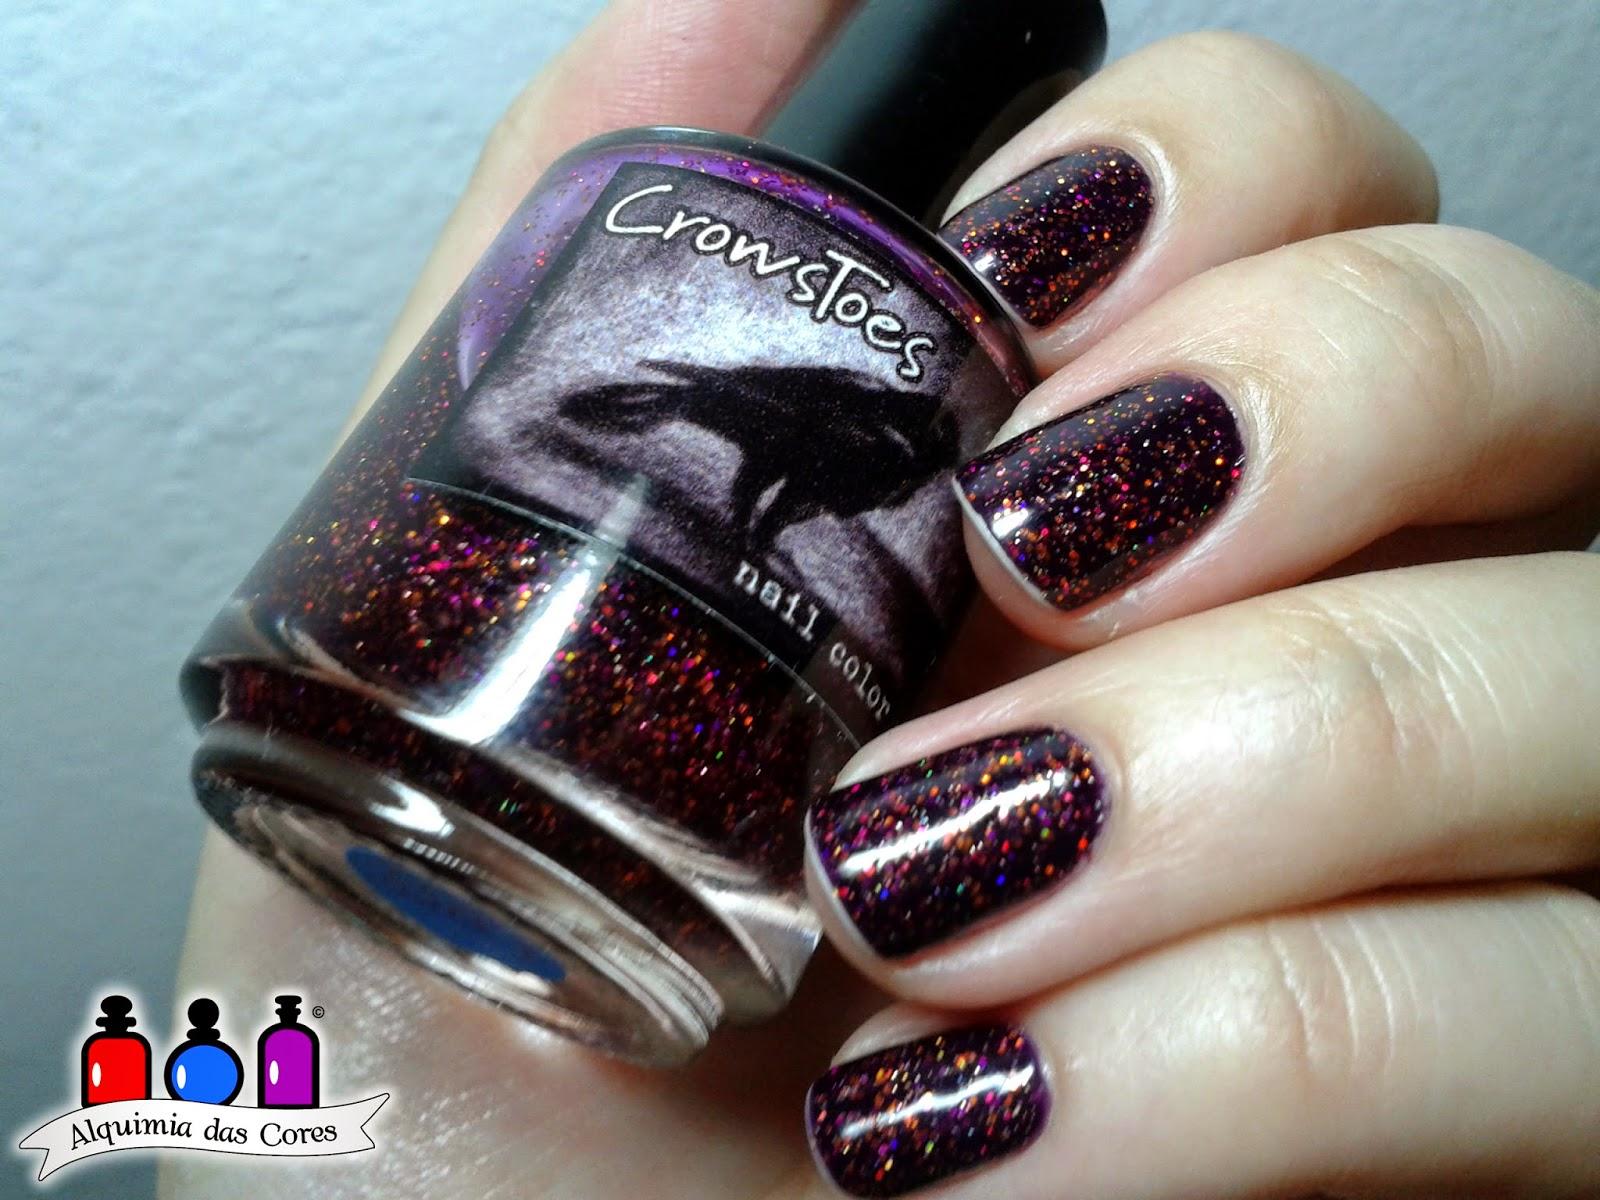 Crowstoes, Glitter, Caminie, Roxo, revlon, Plum Night, Cremoso, esmalte, nail polish